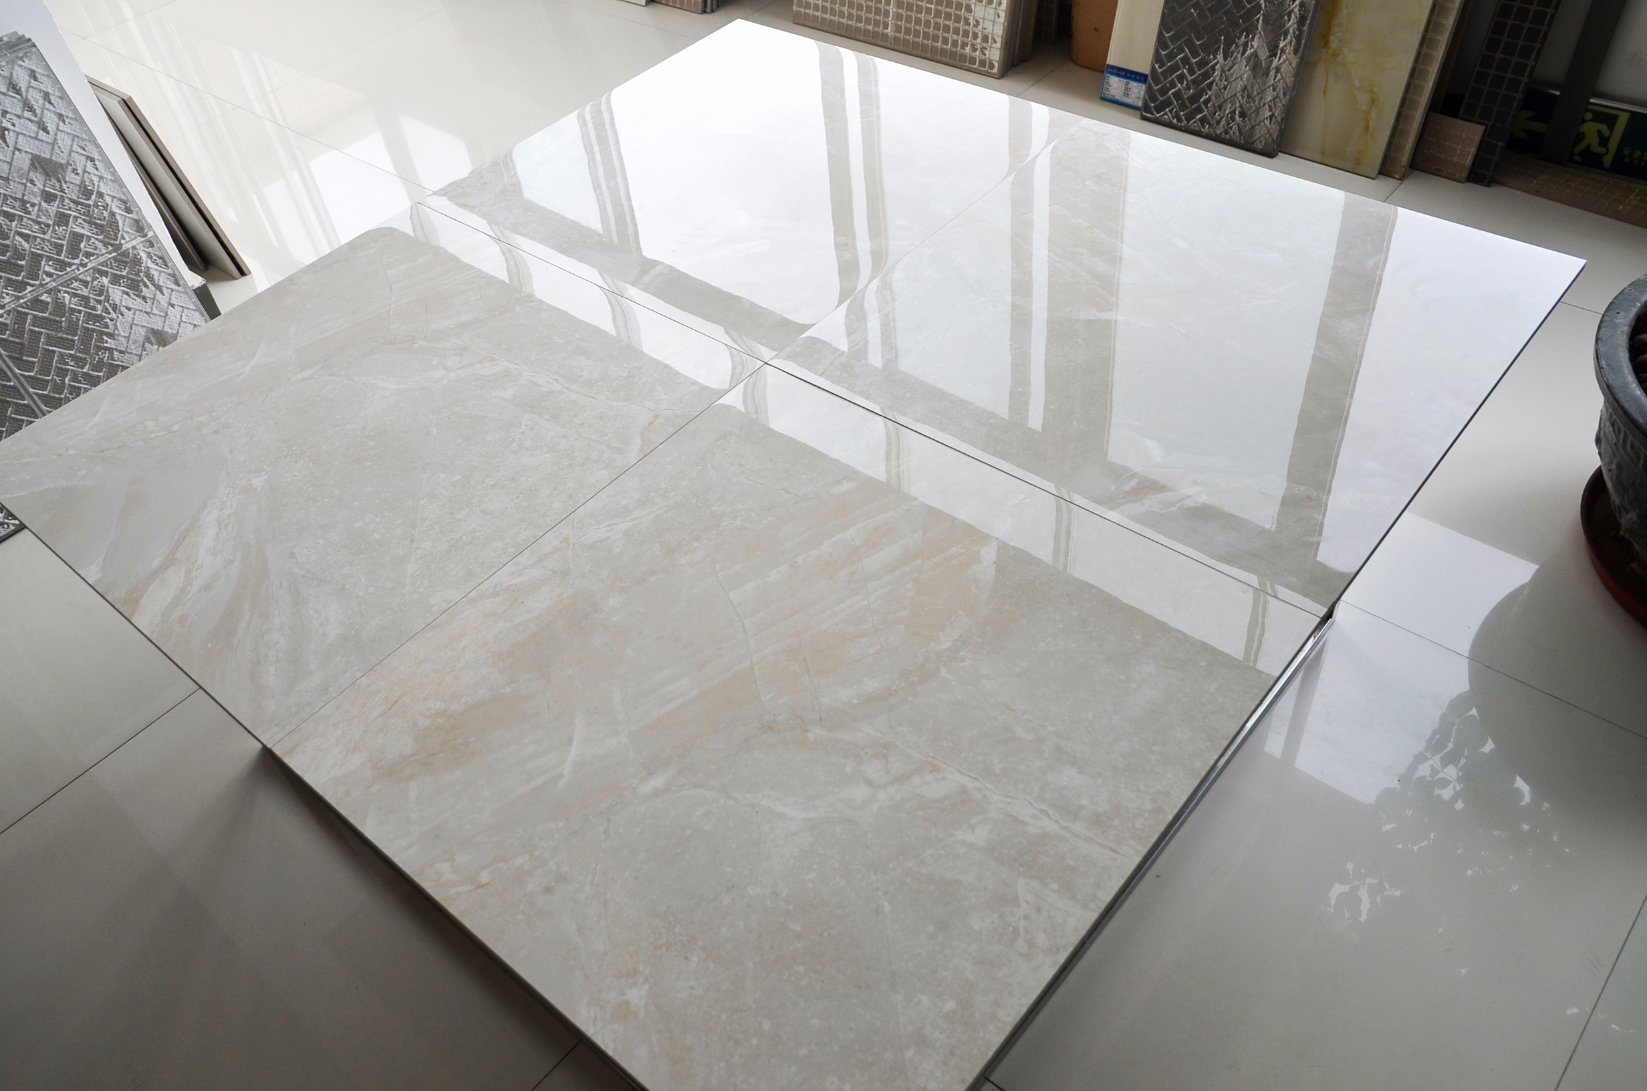 China Ceramic Tiles In Turkey For Bathrooms Vitrified Tiles Floor